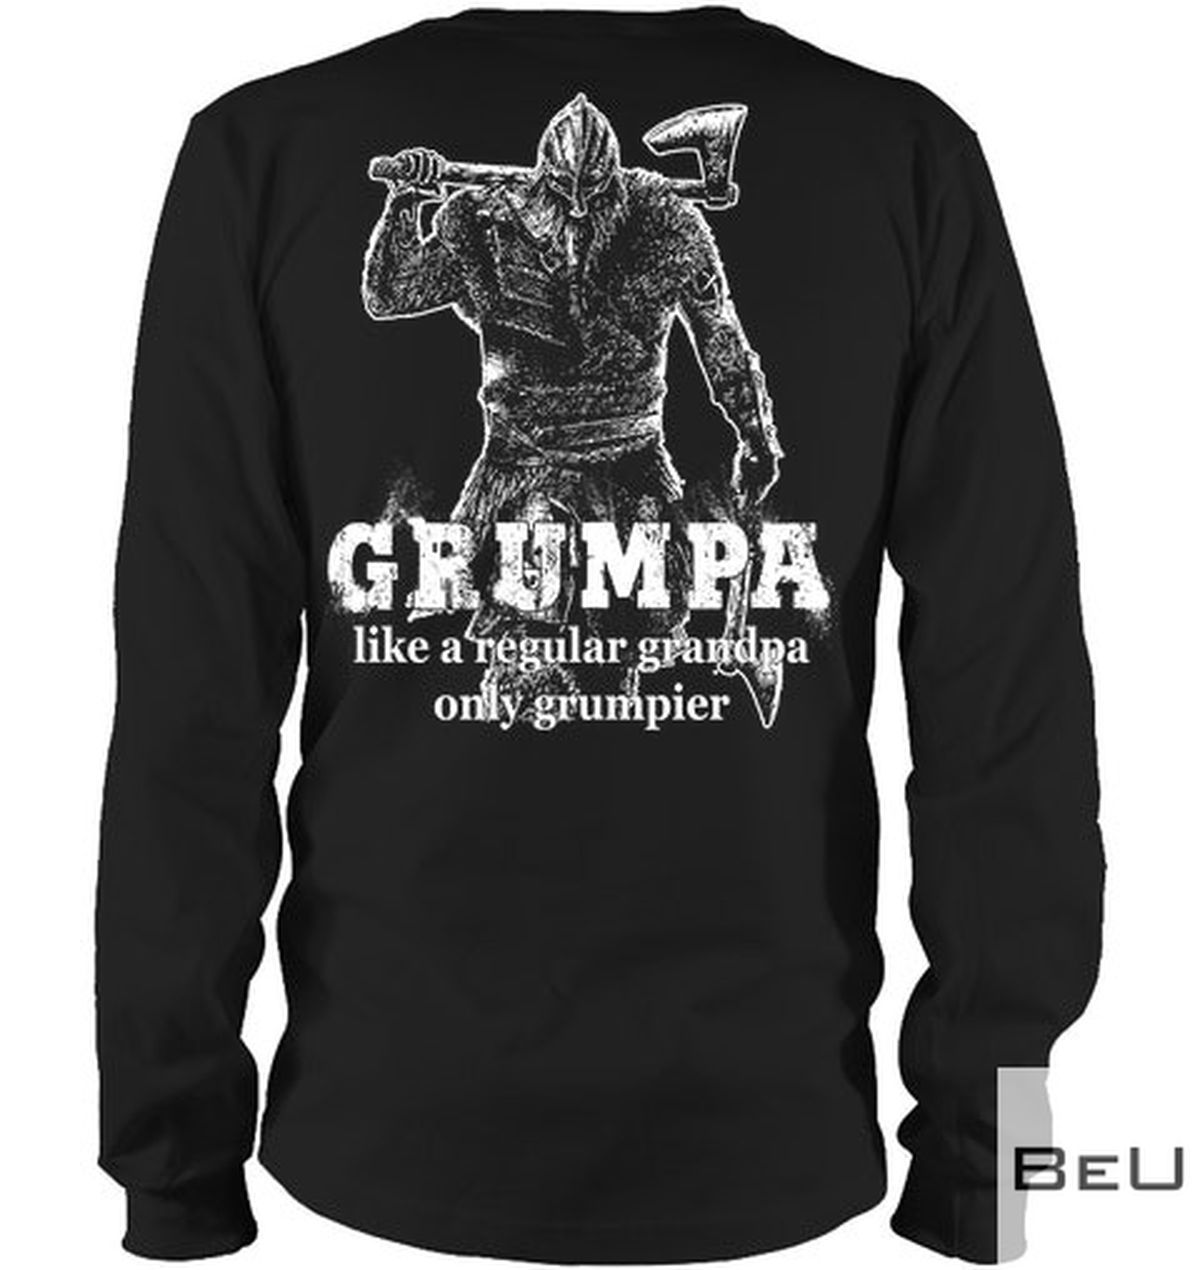 Viking Grumpa like a regular grandpa only grumpier shirtx